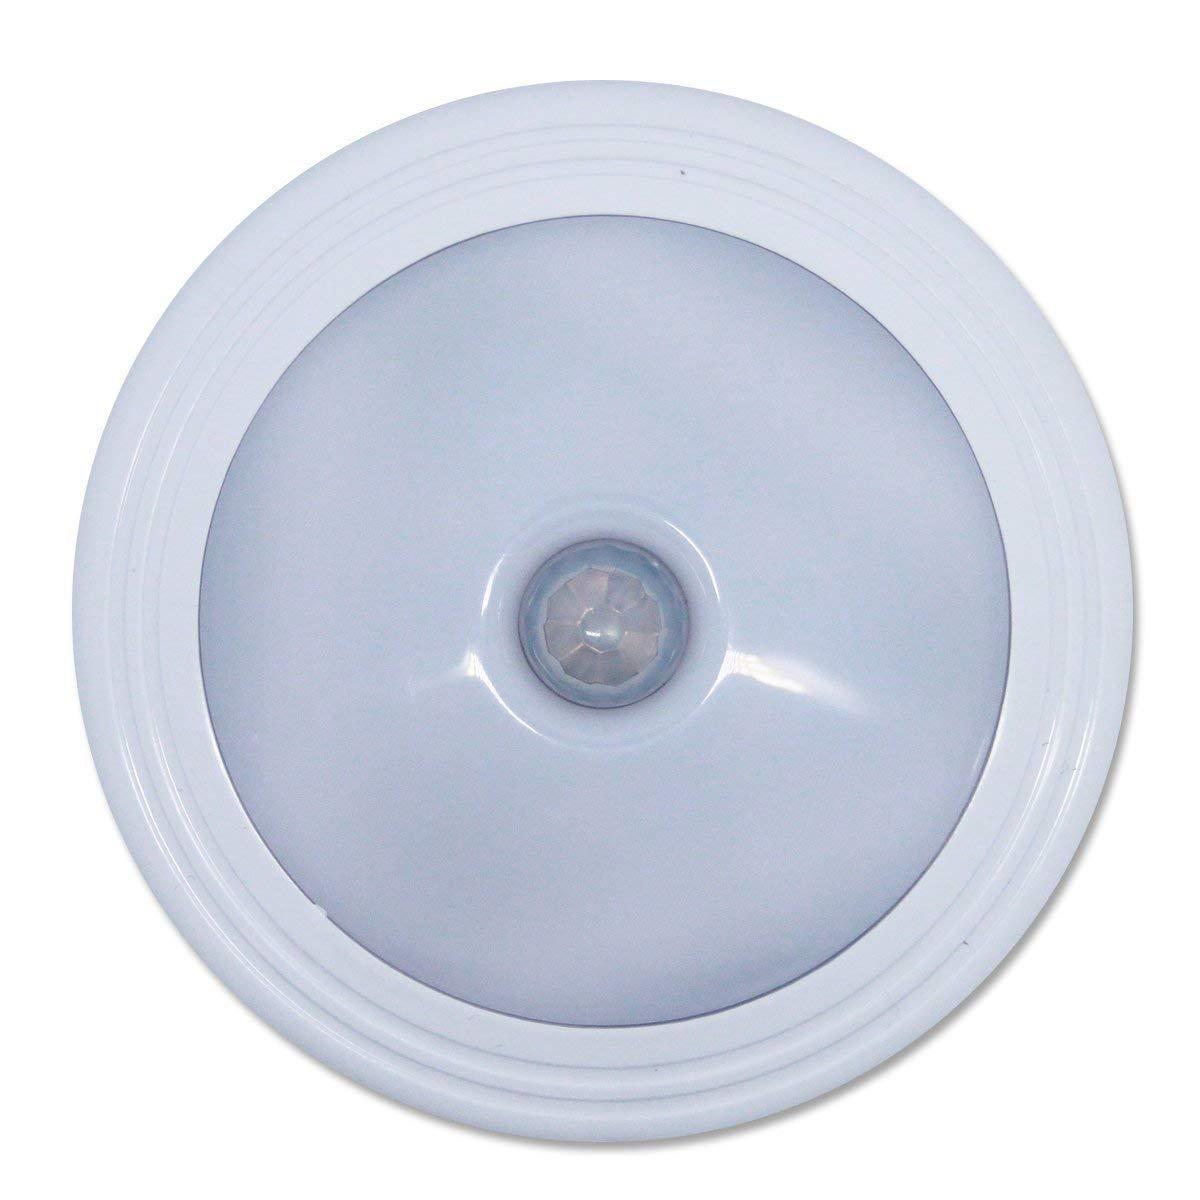 Motion Sensor Closet Light Battery Powered Self Stick Perfect in Closet Lighting Night Light Tap on Lights for Bathroom Bedroom Nursery [3 Pack]